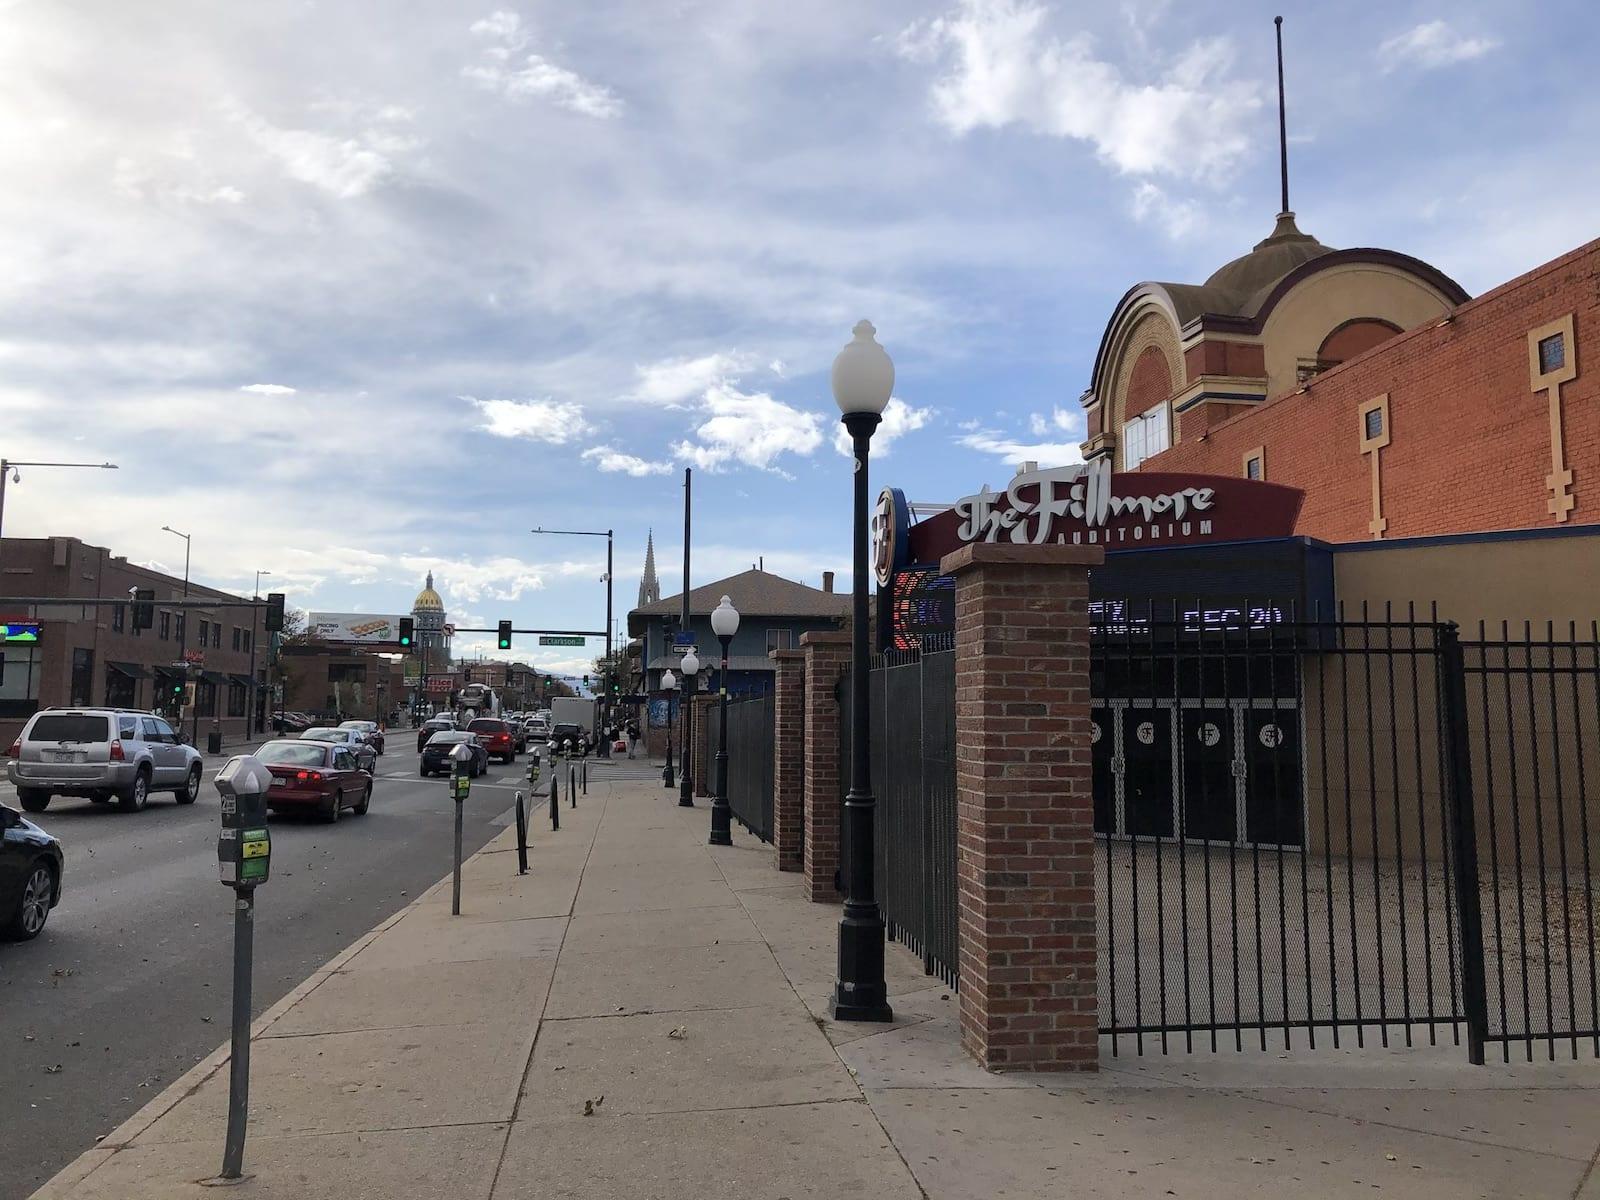 The Fillmore Auditorium Denver CO